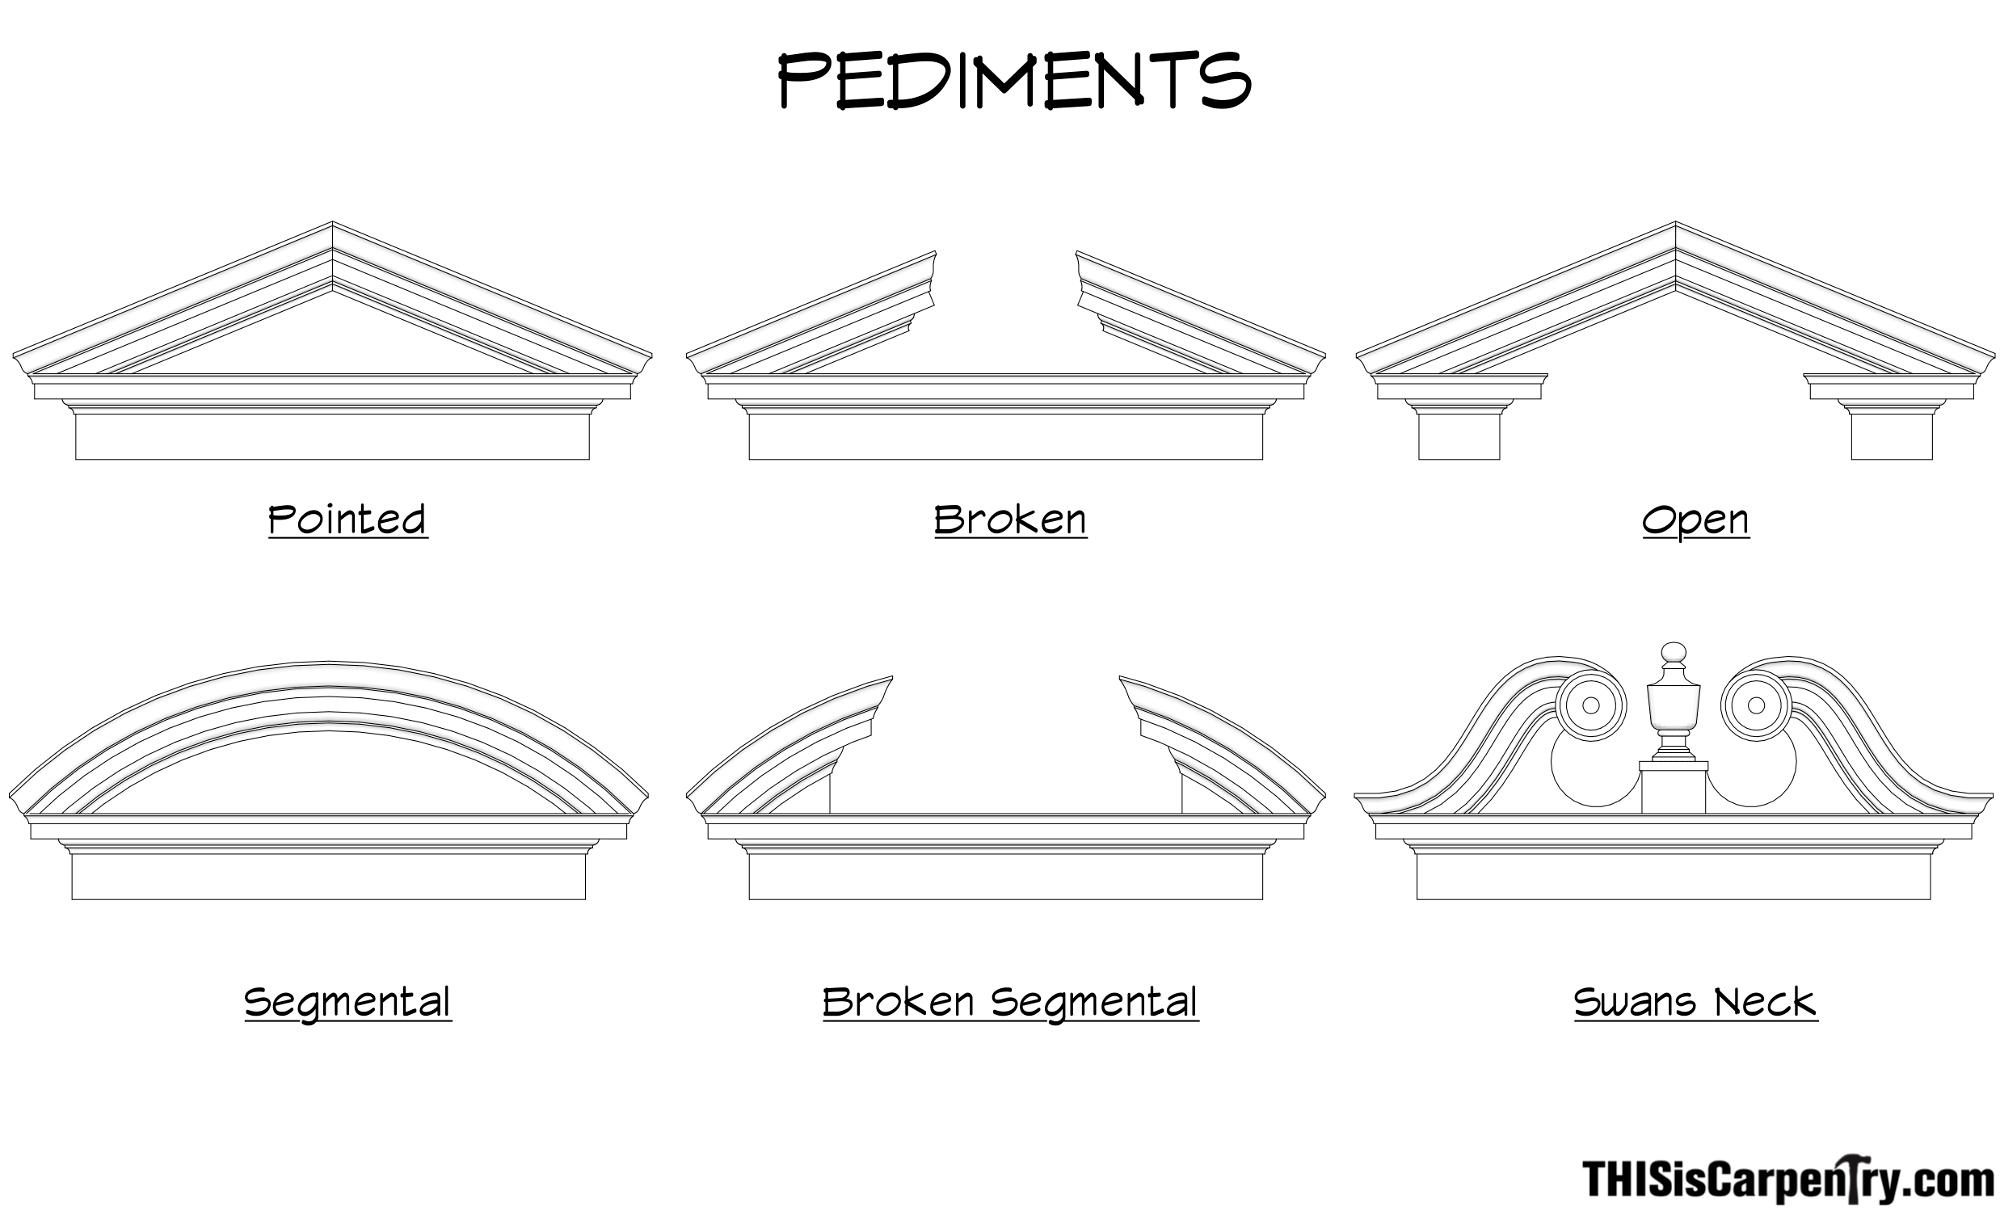 Pediments-1